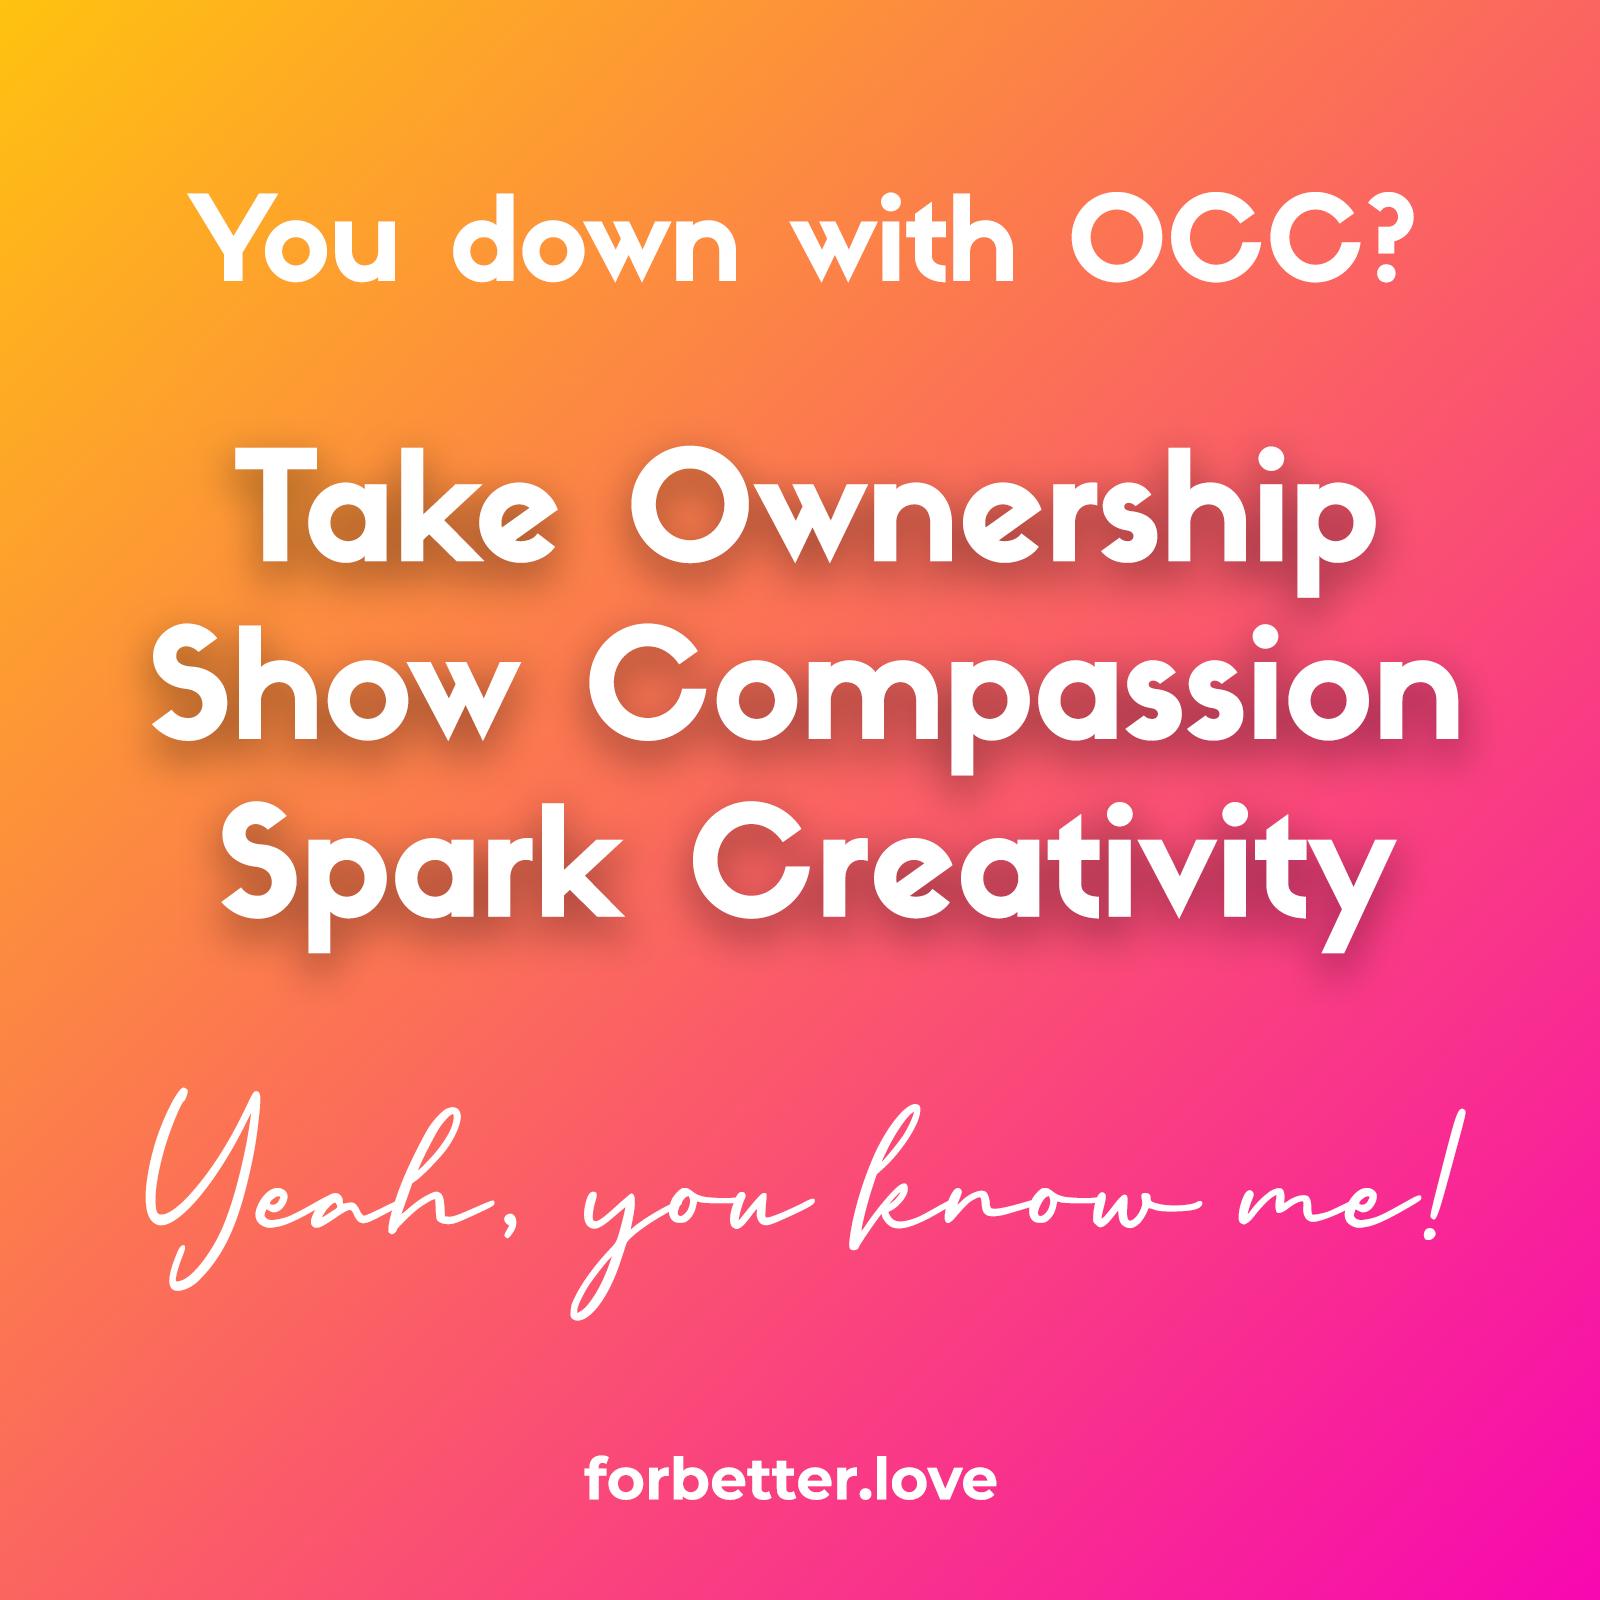 OCCFor Better Love Ownership CompassionCreativity equals End of Argument Blog